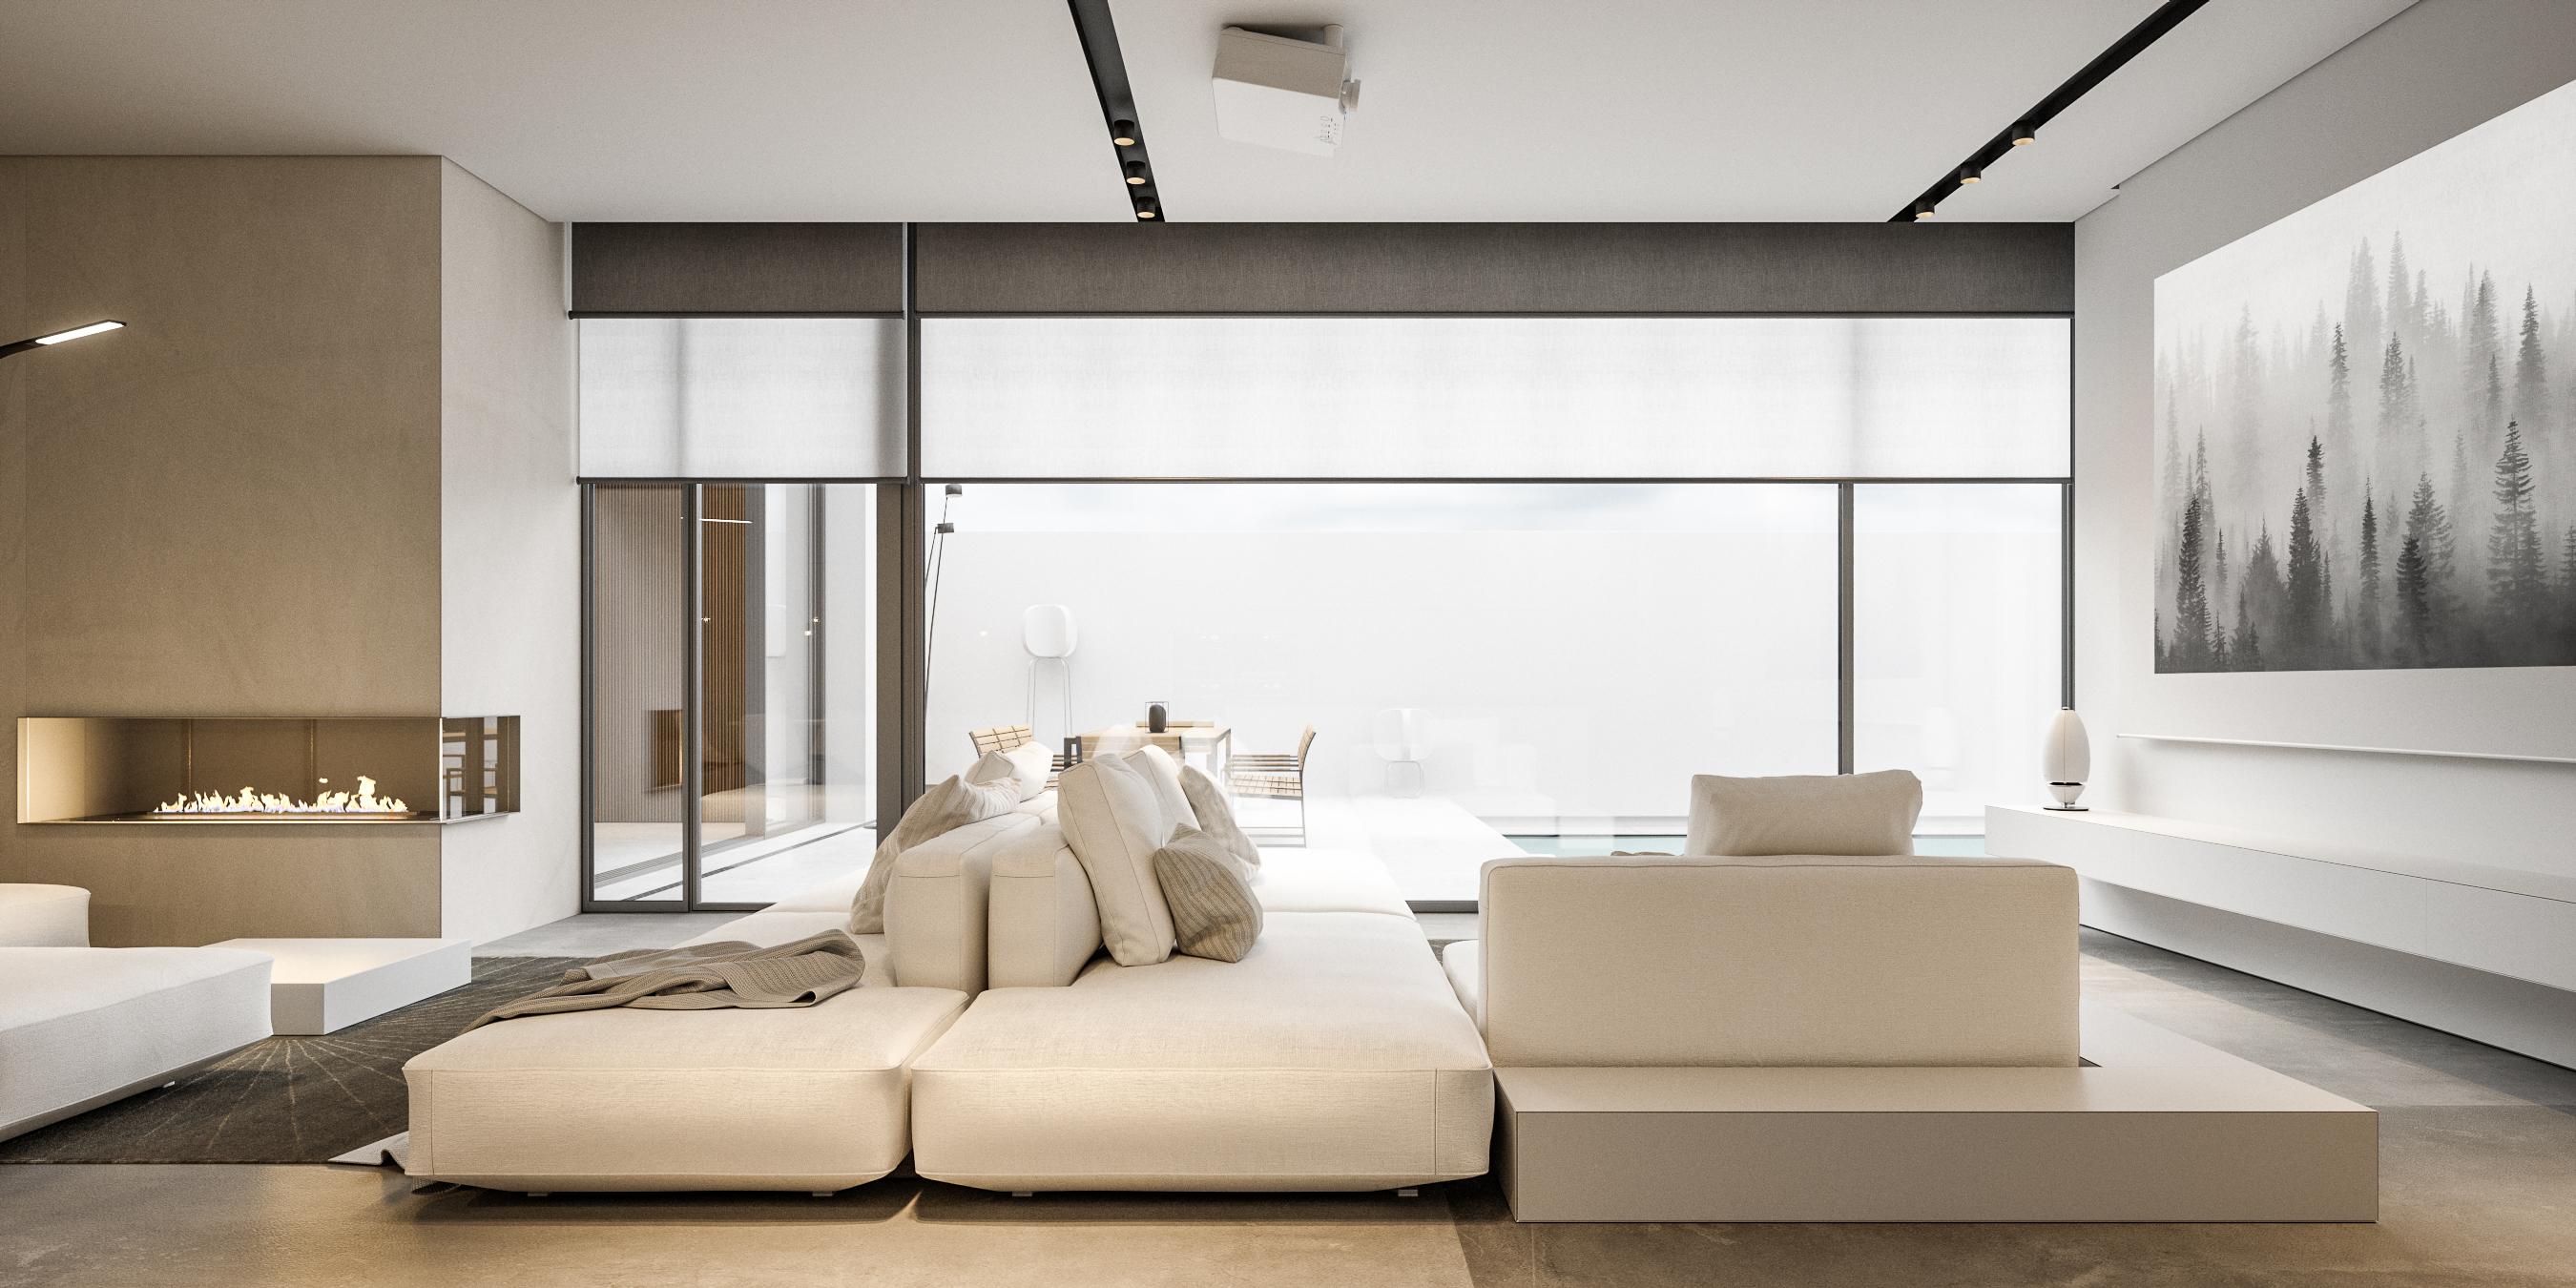 Living Room - A House